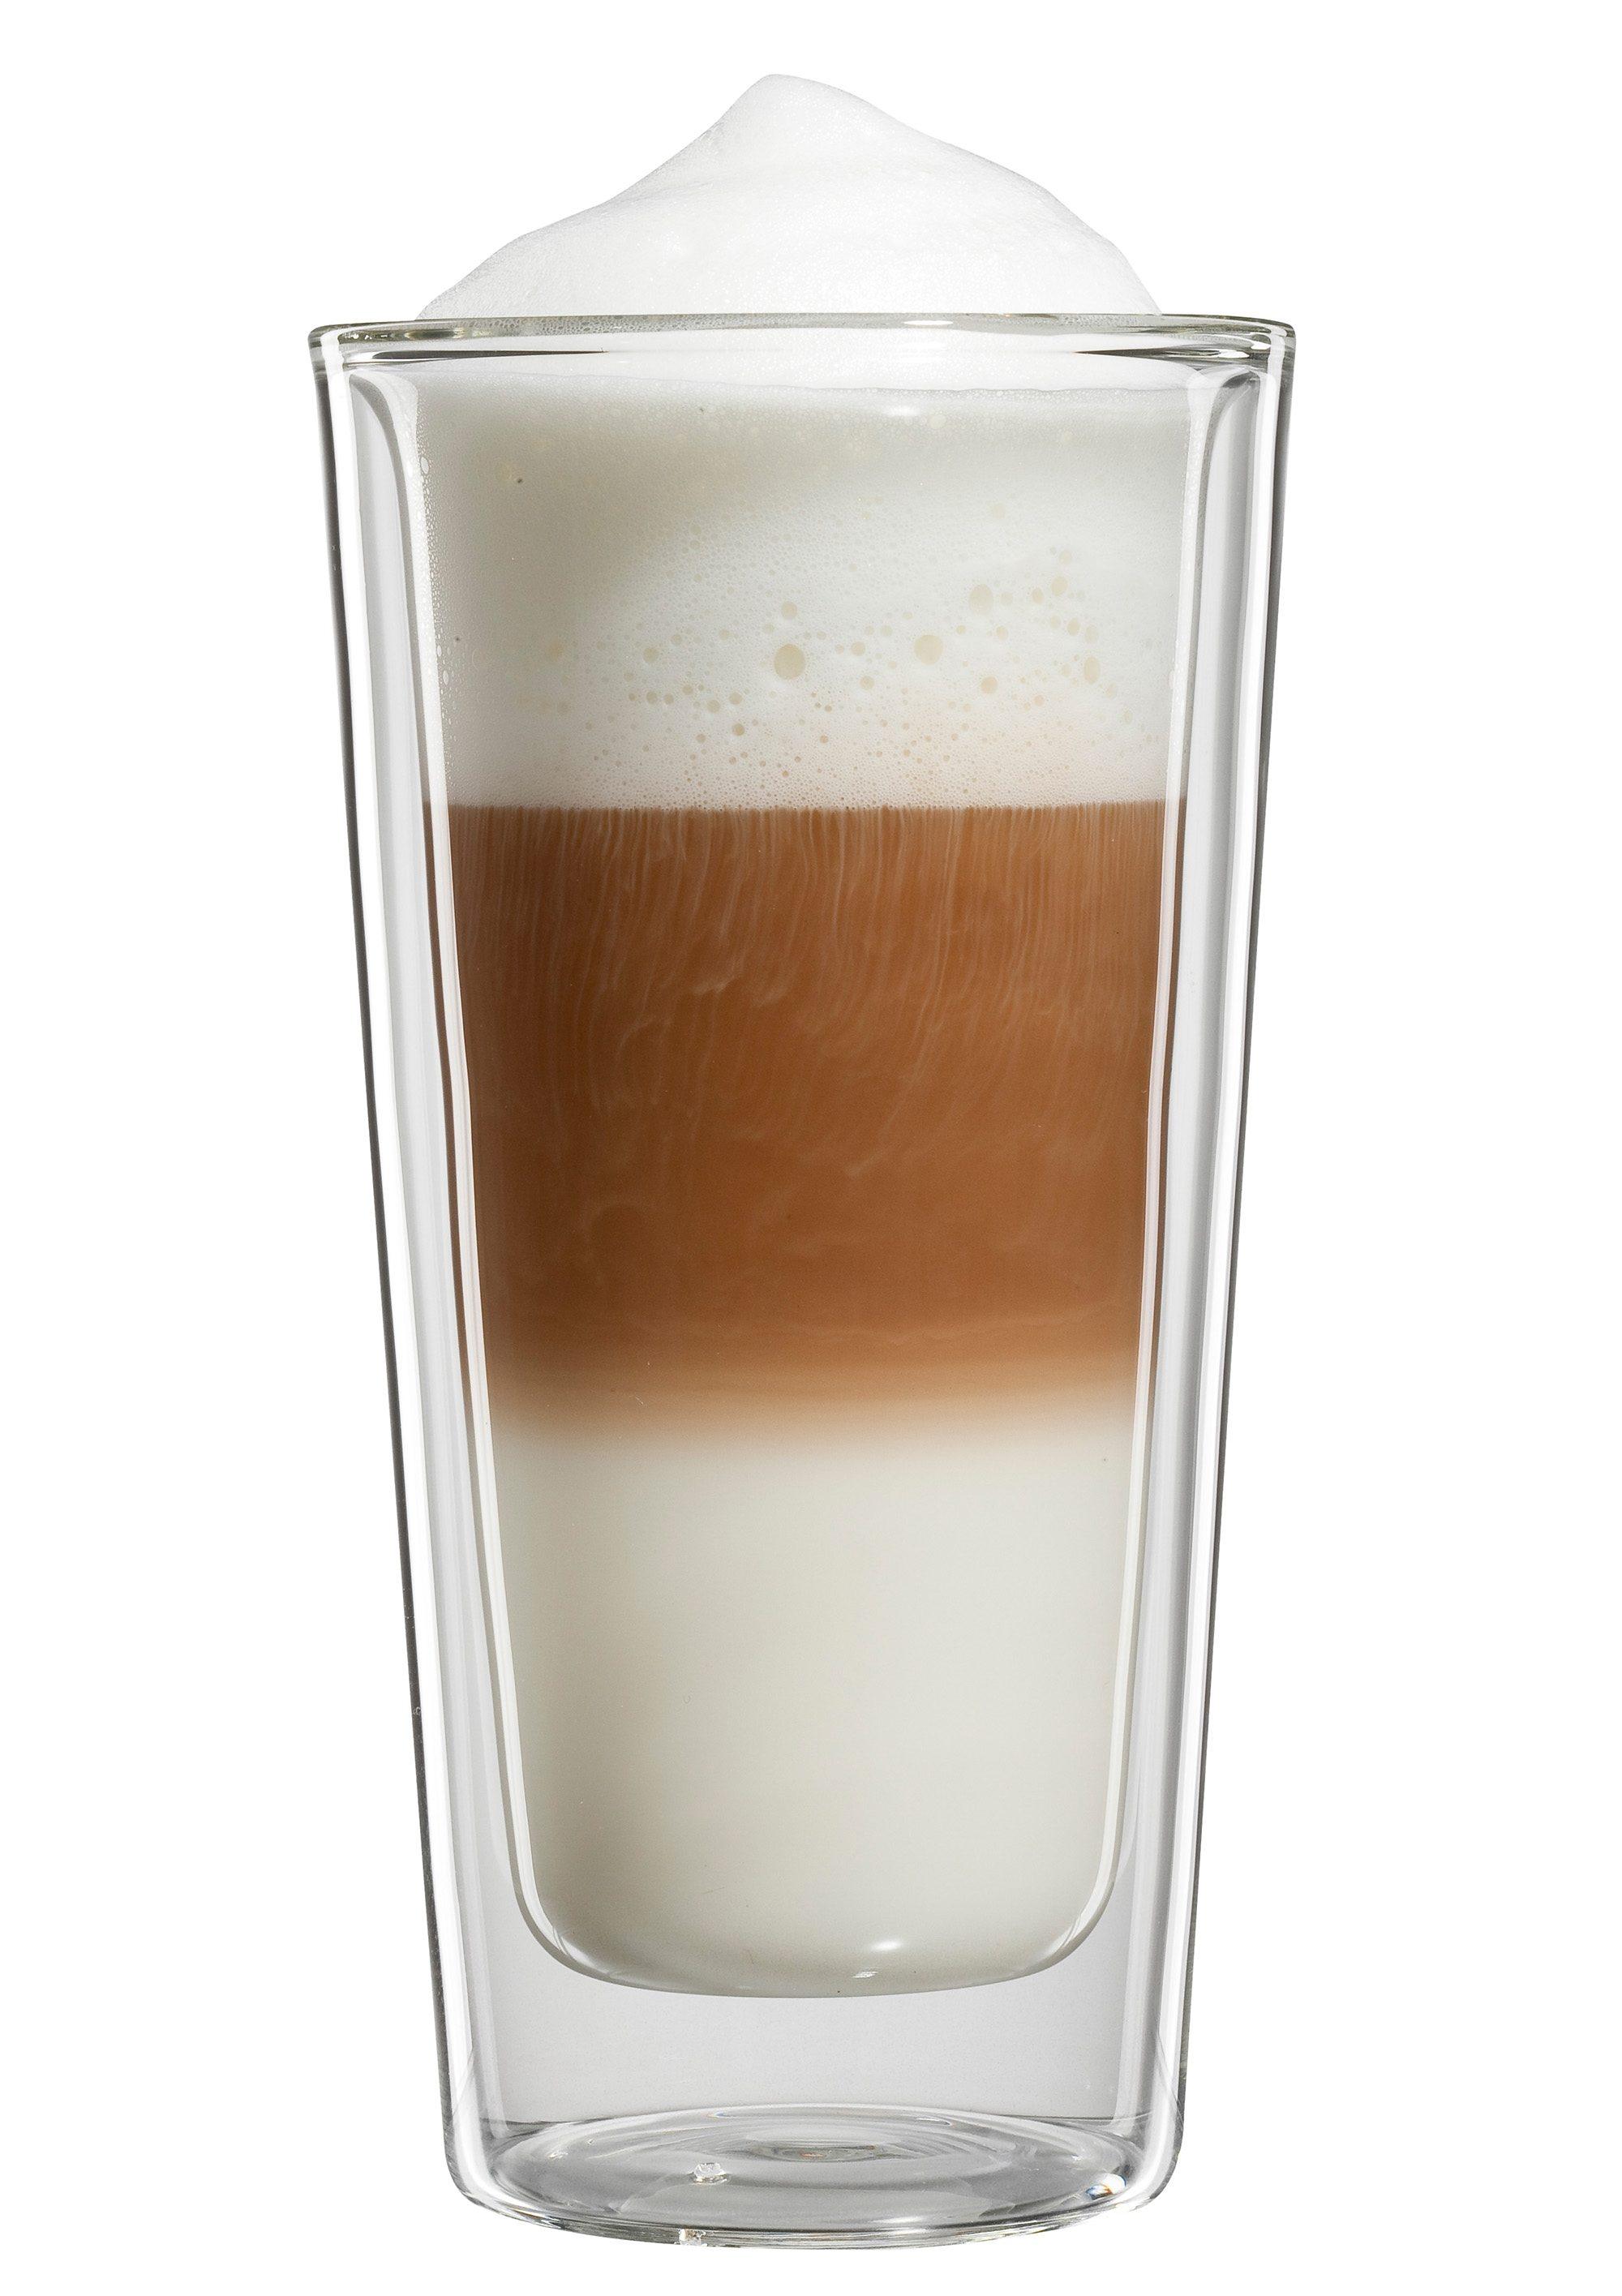 bloomix Latte Macchiato-Glas, 4er Set, »Milano Grande«